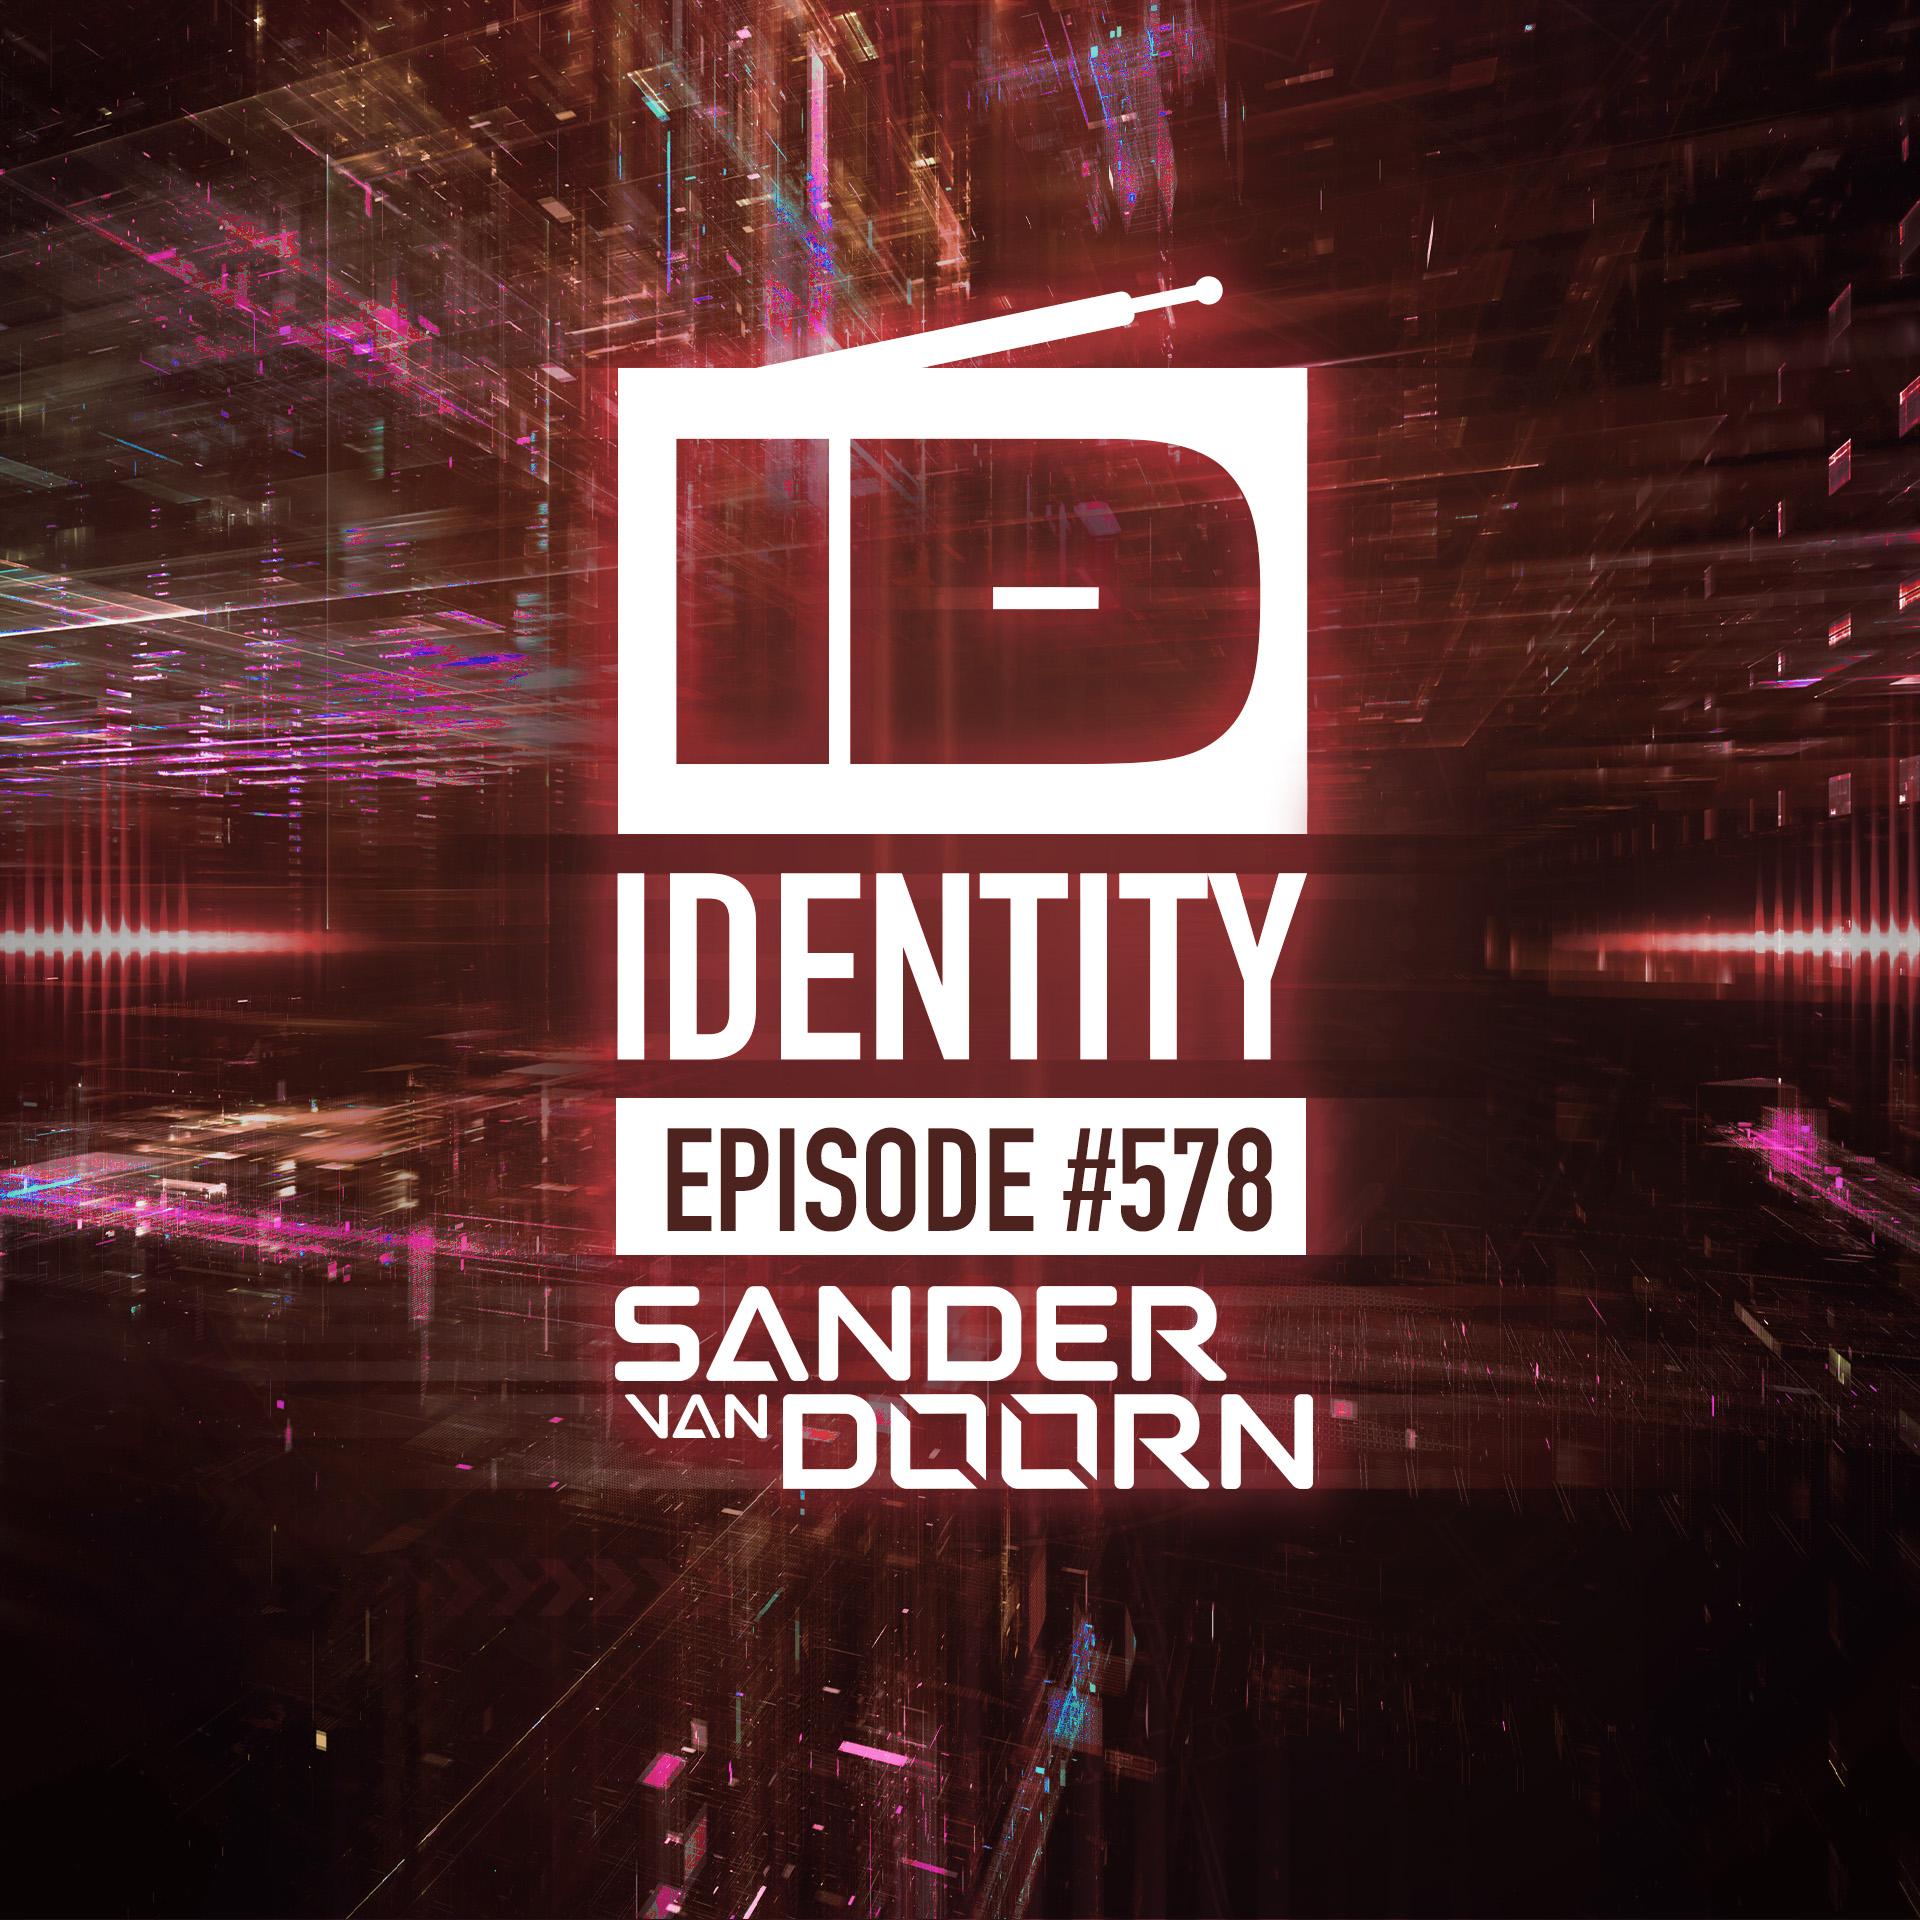 Identity 578